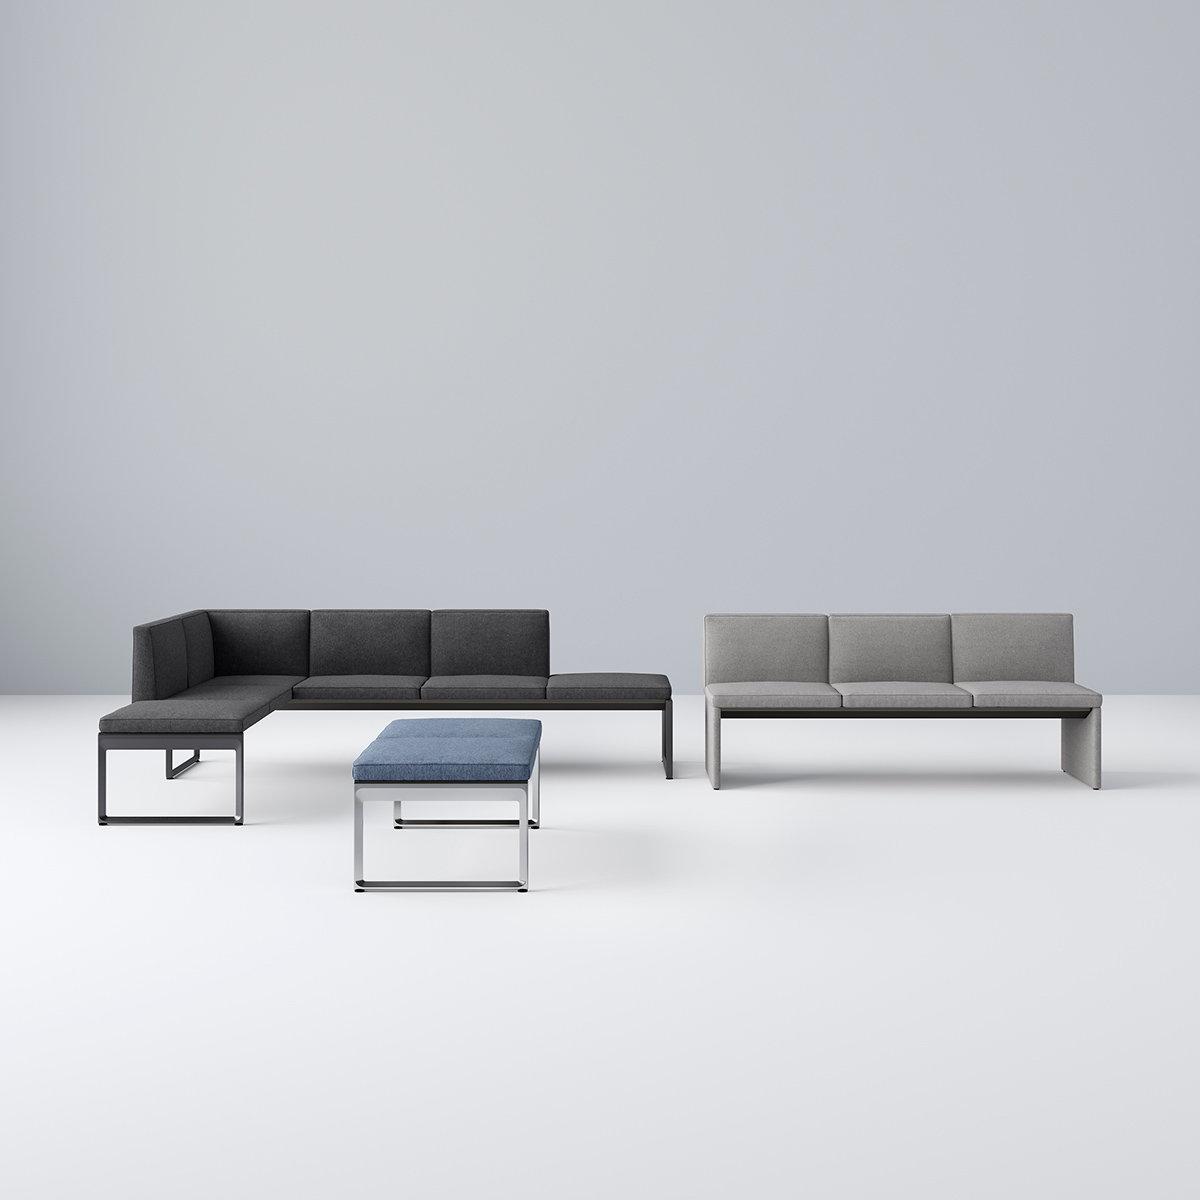 Remarkable Studio Tk Launches Clique Modular Furniture System Ibusinesslaw Wood Chair Design Ideas Ibusinesslaworg